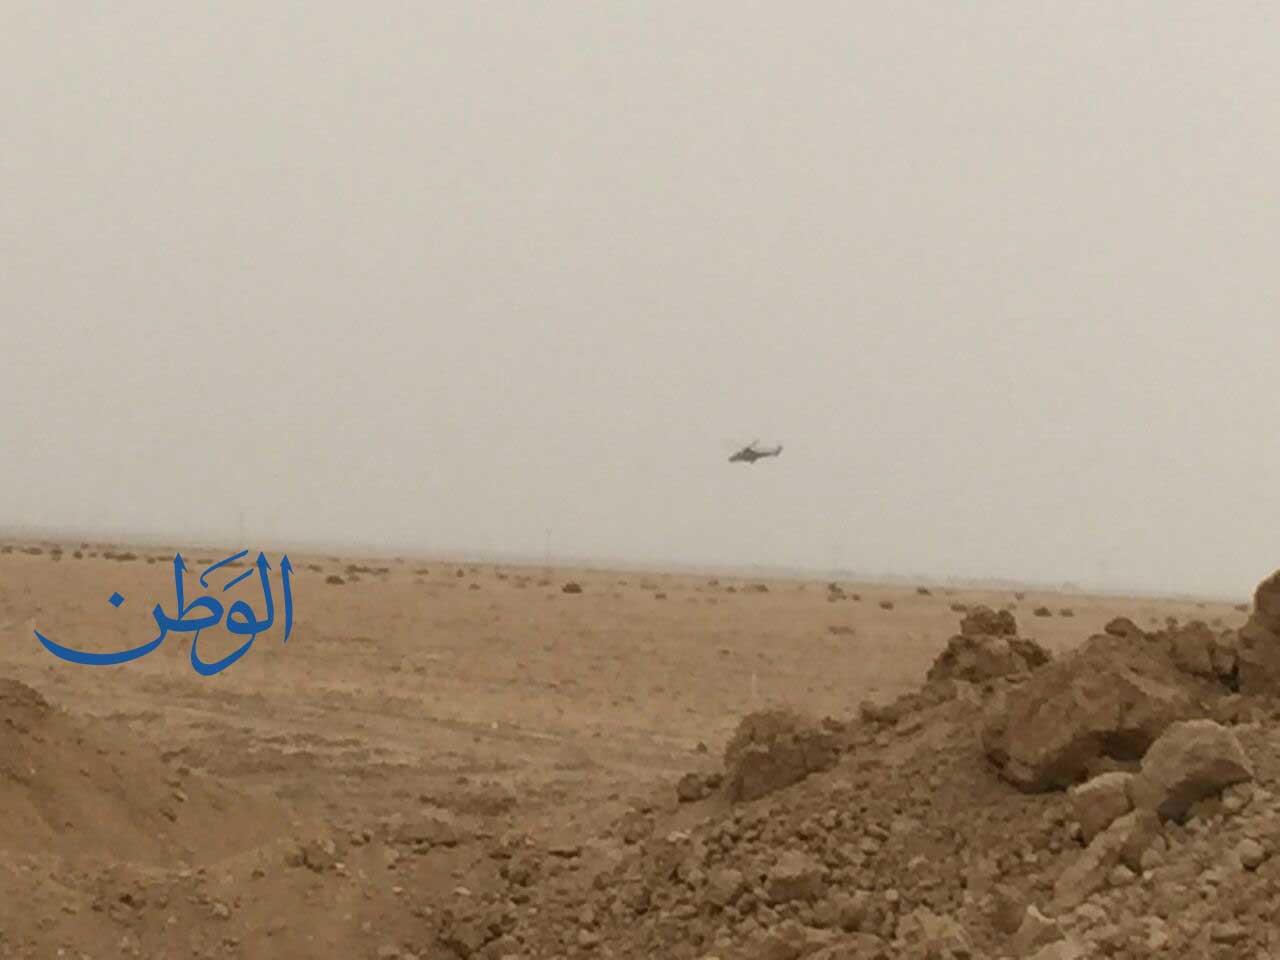 Photo of بالصور.. الجيش السوري يسيطر على مدخل البيارات في بادية تدمر